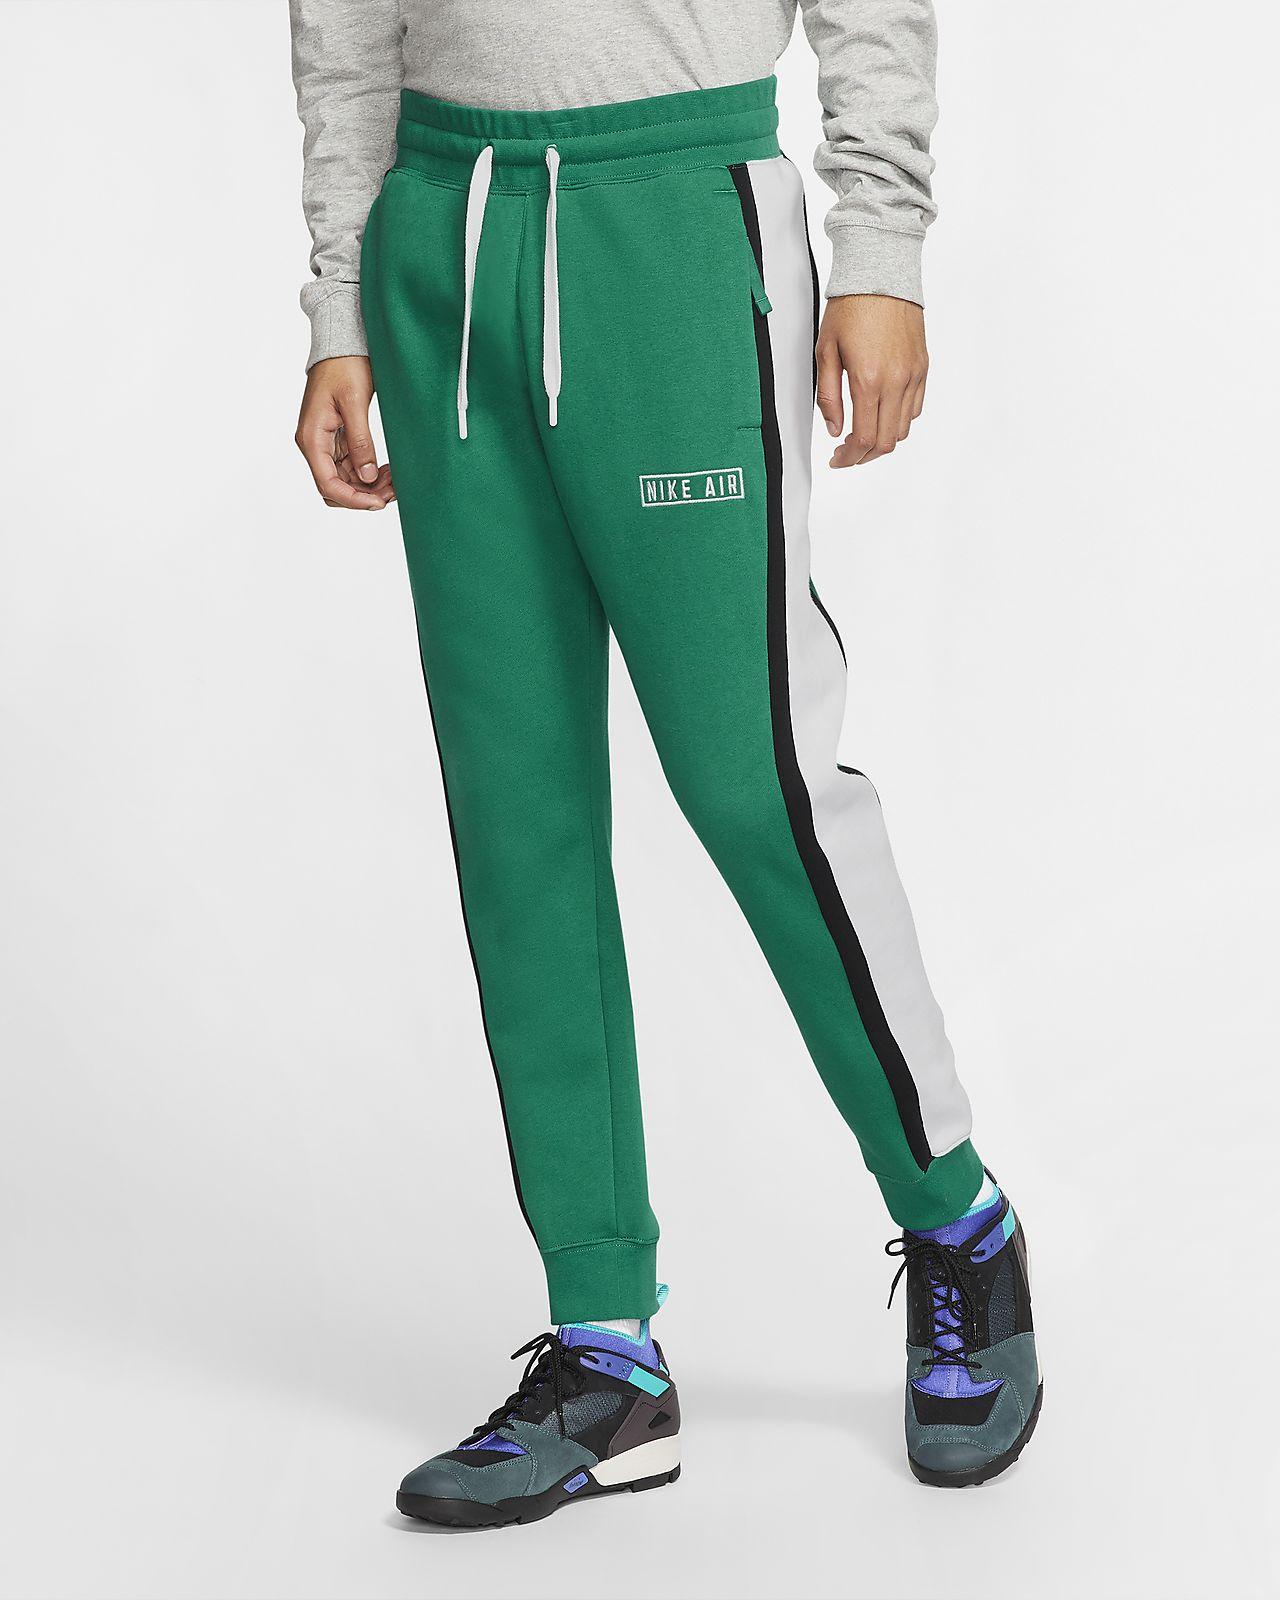 Nike Air-fleecebukser til mænd